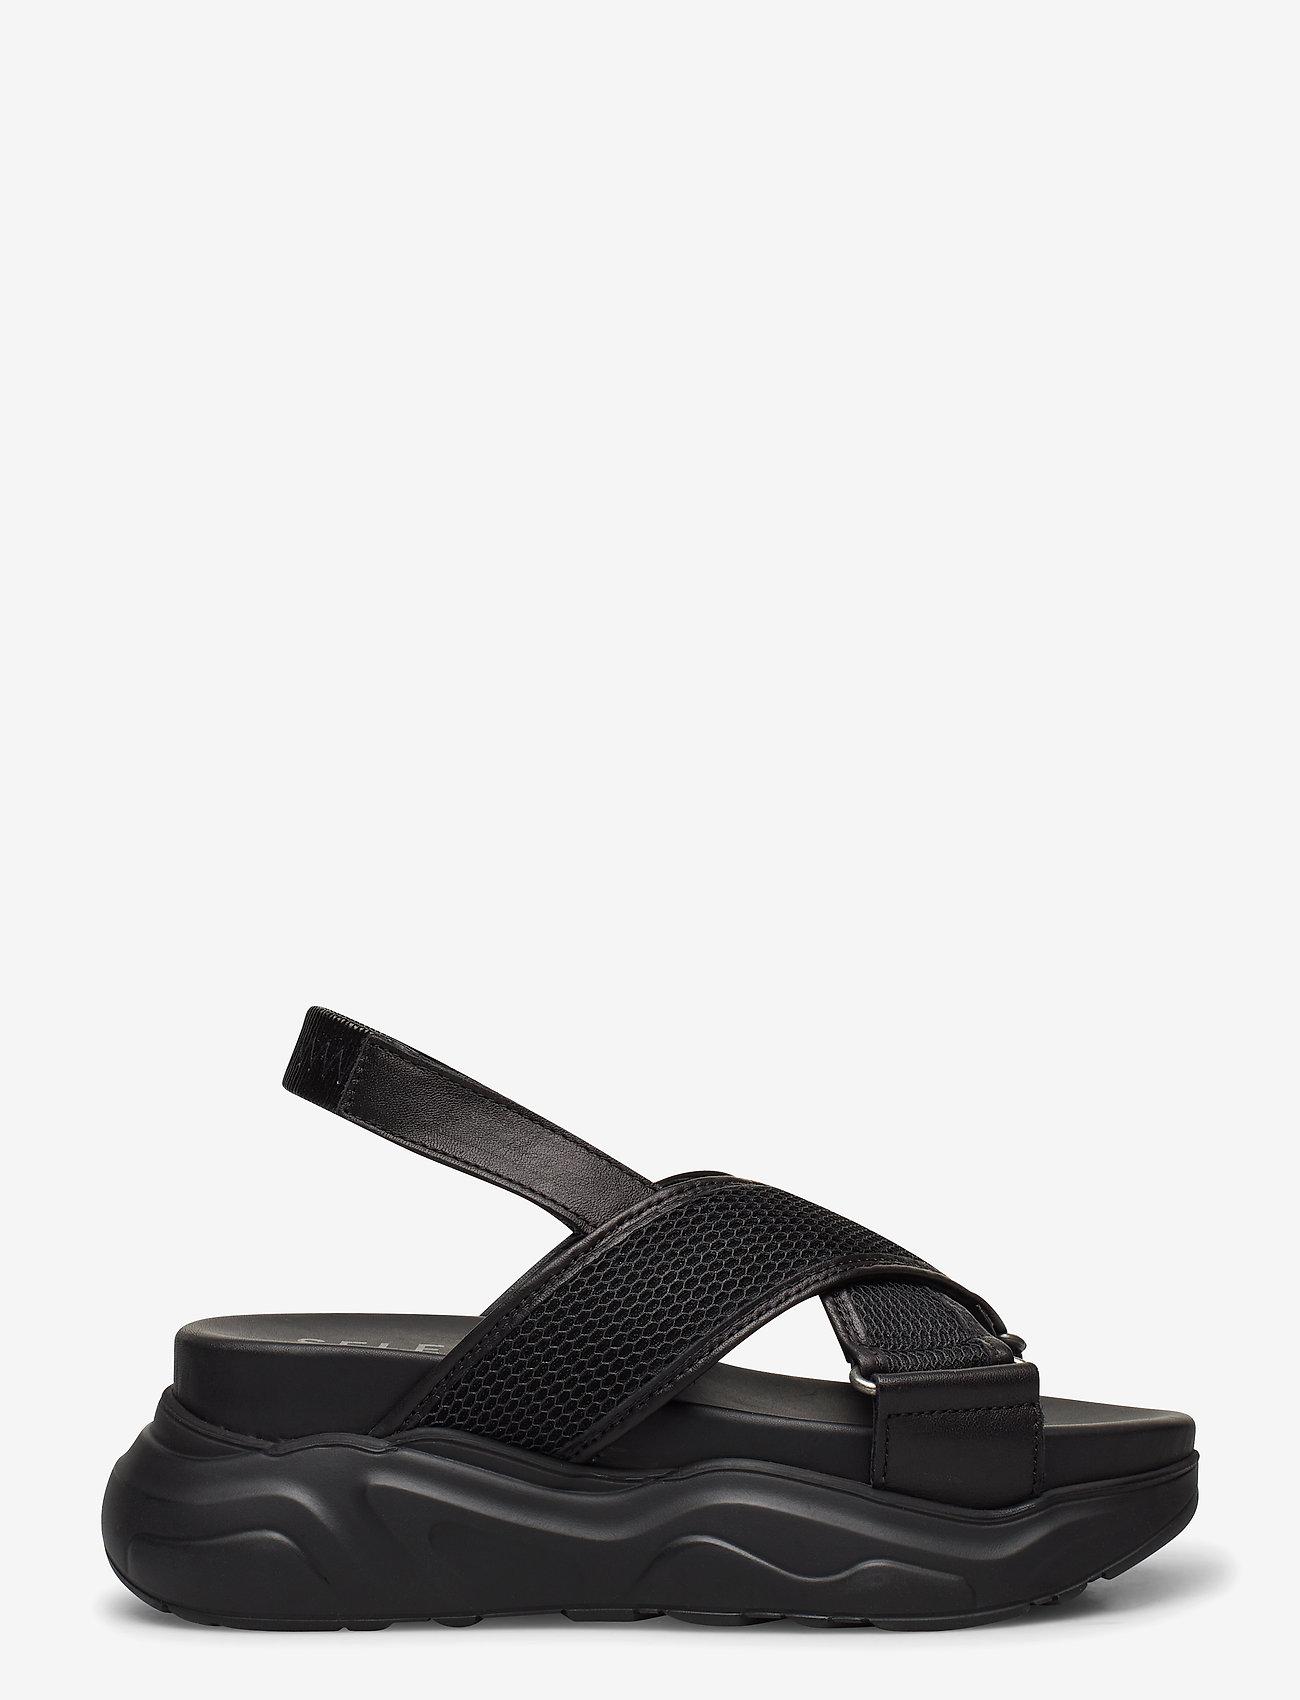 Selected Femme - SLFOLLIE SANDAL B - flat sandals - black